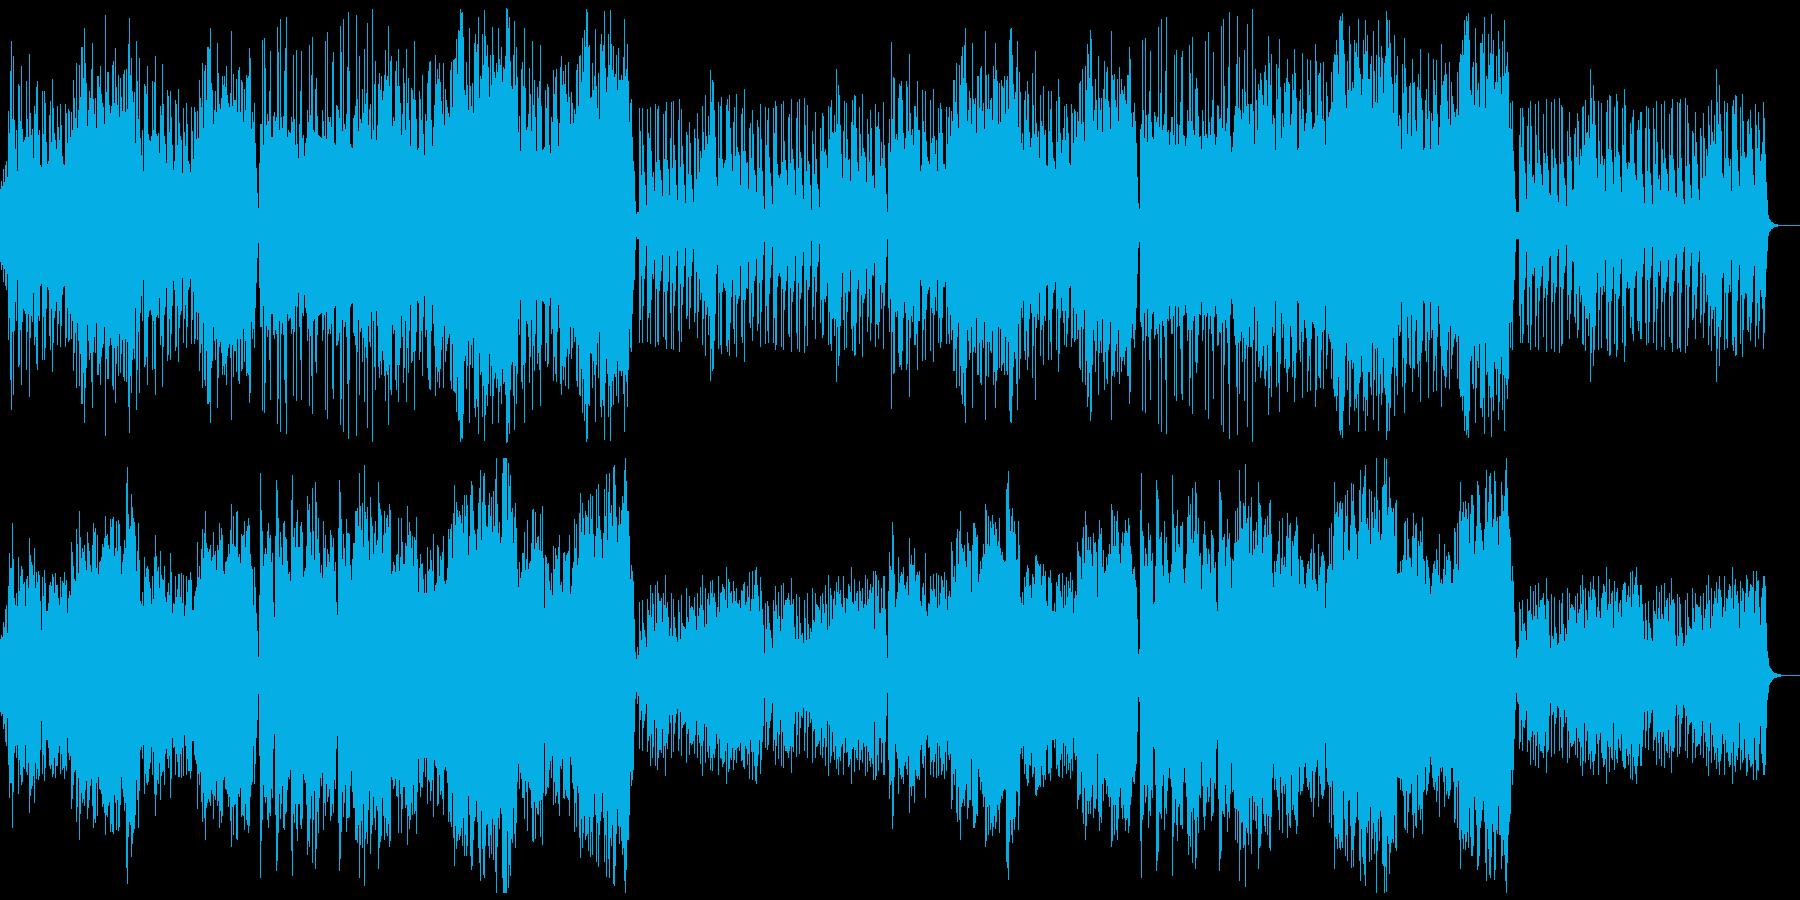 RPGの町をイメージしたオーケストラの再生済みの波形